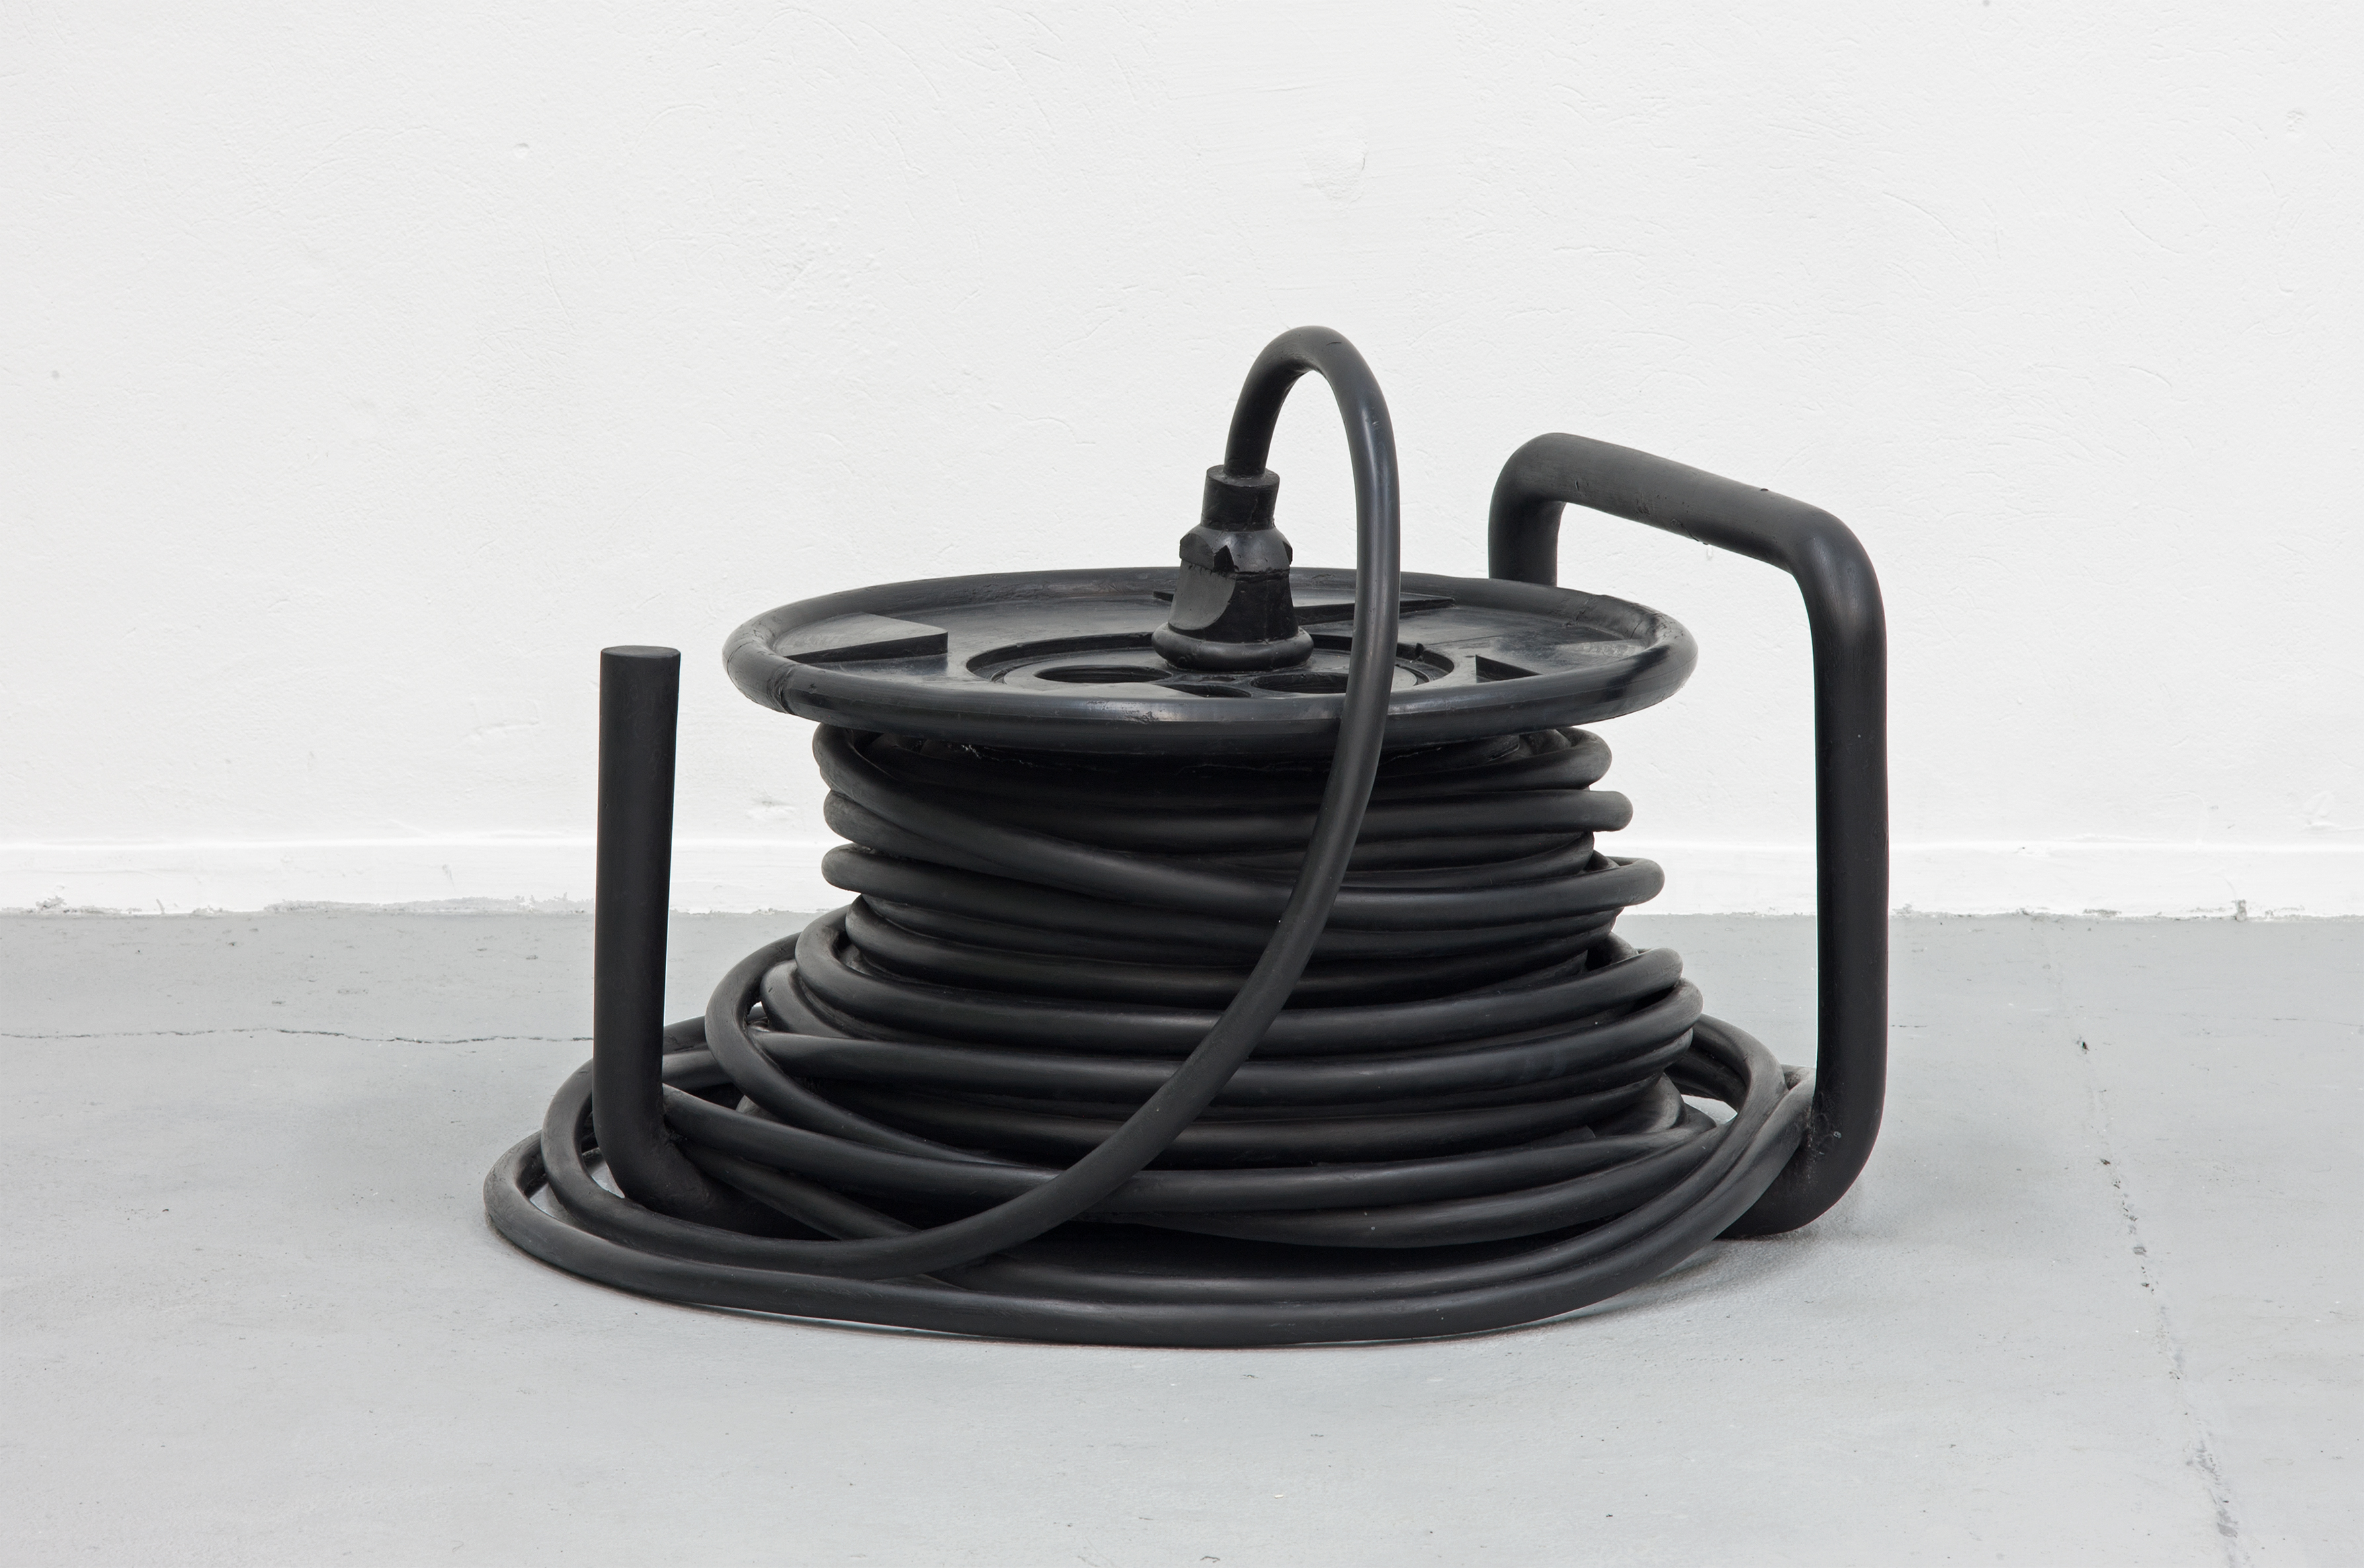 Artwork by Erik Andersen - Kabeltrommel 2010 - Black Sculpture - Epoxy Resin - Dimension 60 x 120 x 100 cm